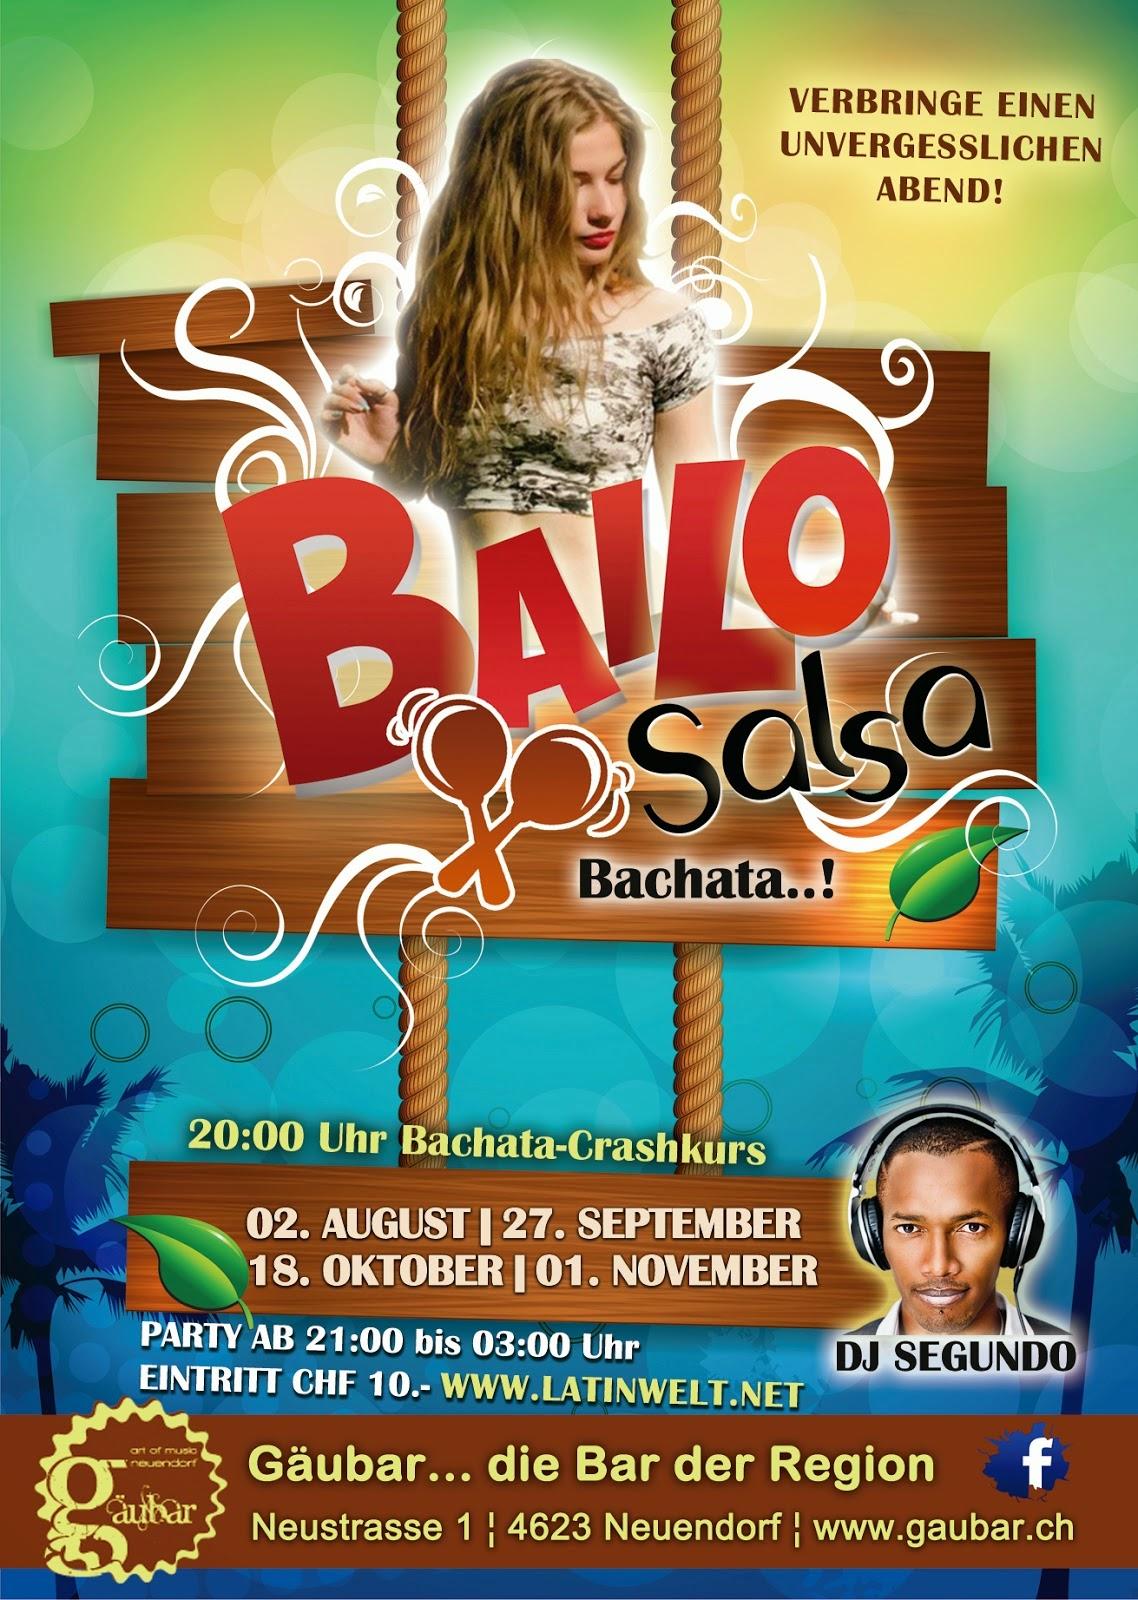 BAILO SALSA, BACHATA..!